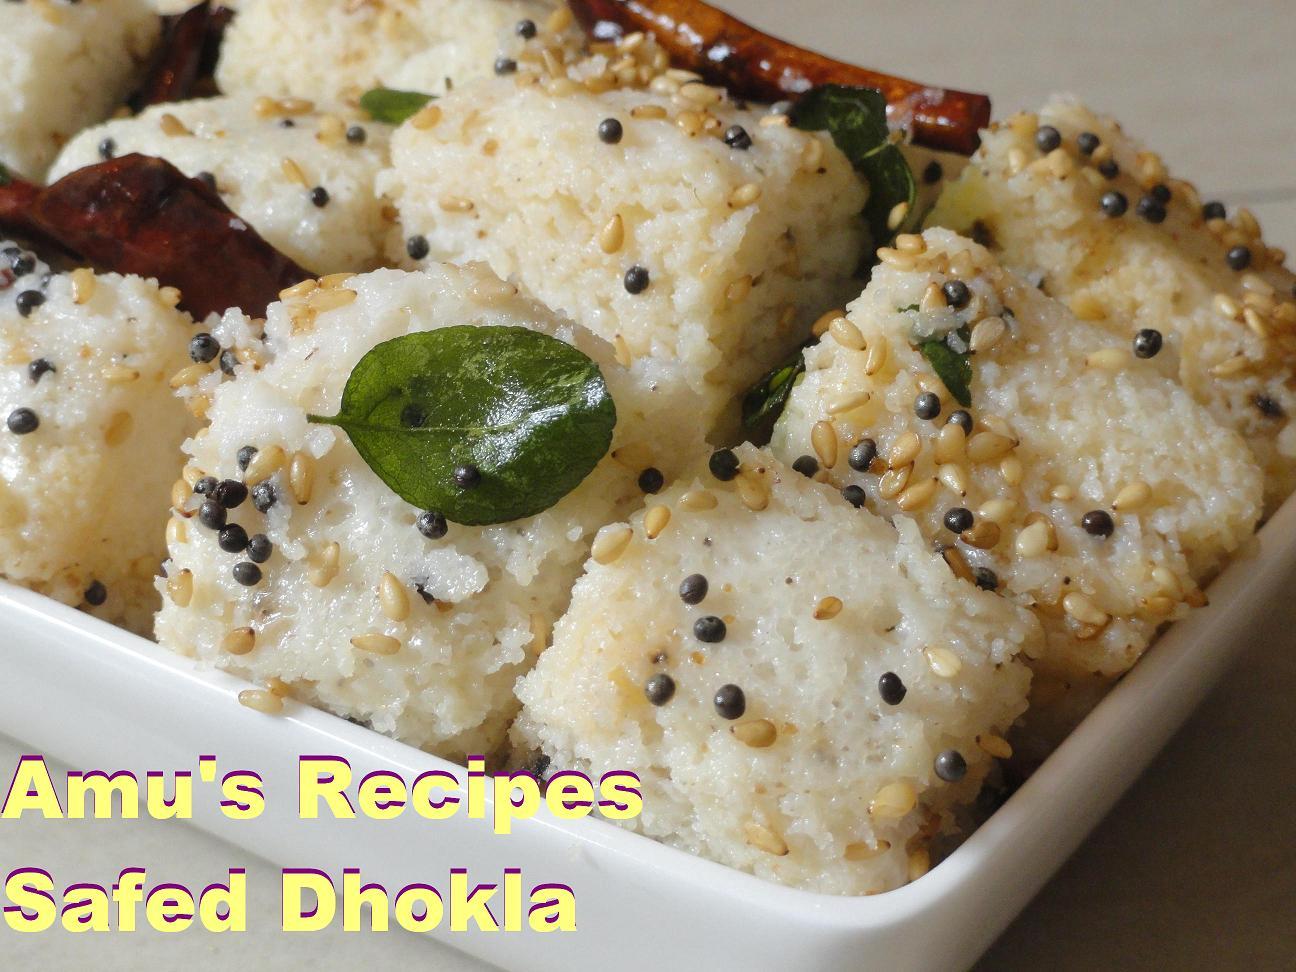 Amus recipes safed dhokla safed dhokla forumfinder Image collections